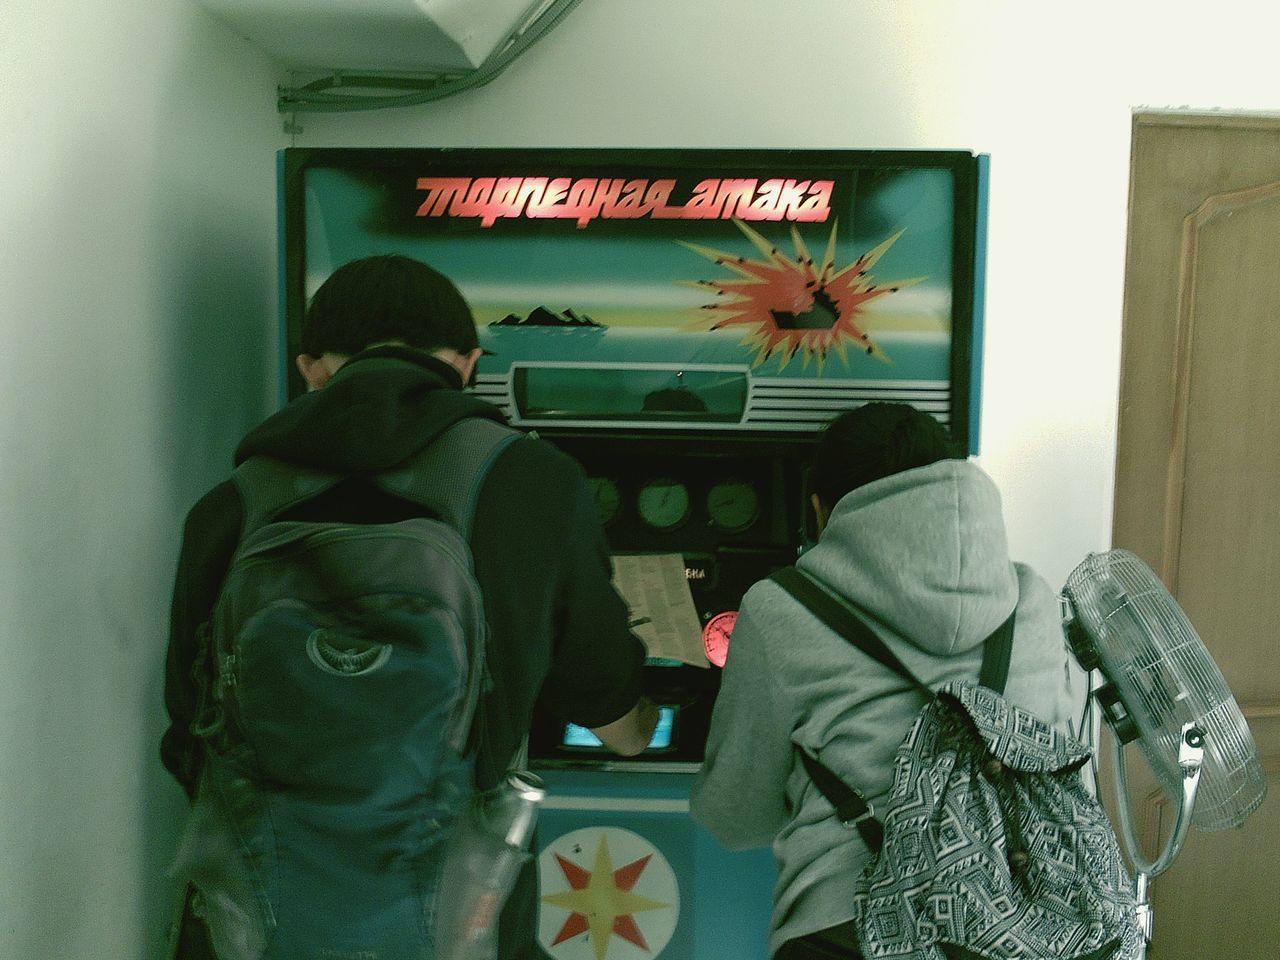 Warm Clothing Pachinko Old Arcade Arcade Games Game Arcade Adult Women Men